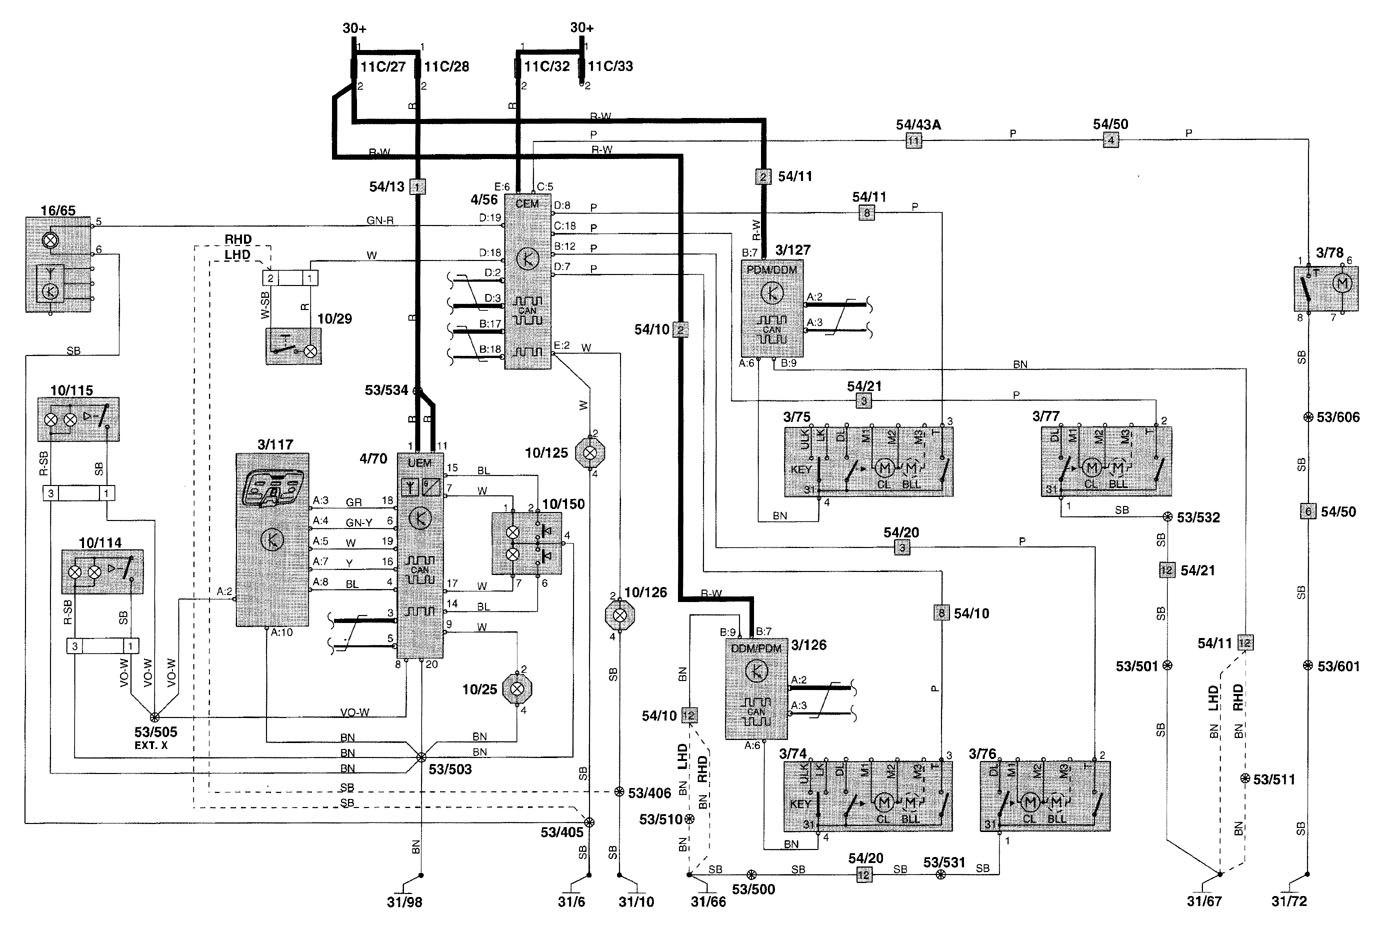 2002 gmc sonoma wiring diagram lights volvo v70  2001 2002  wiring diagrams interior lighting  volvo v70  2001 2002  wiring